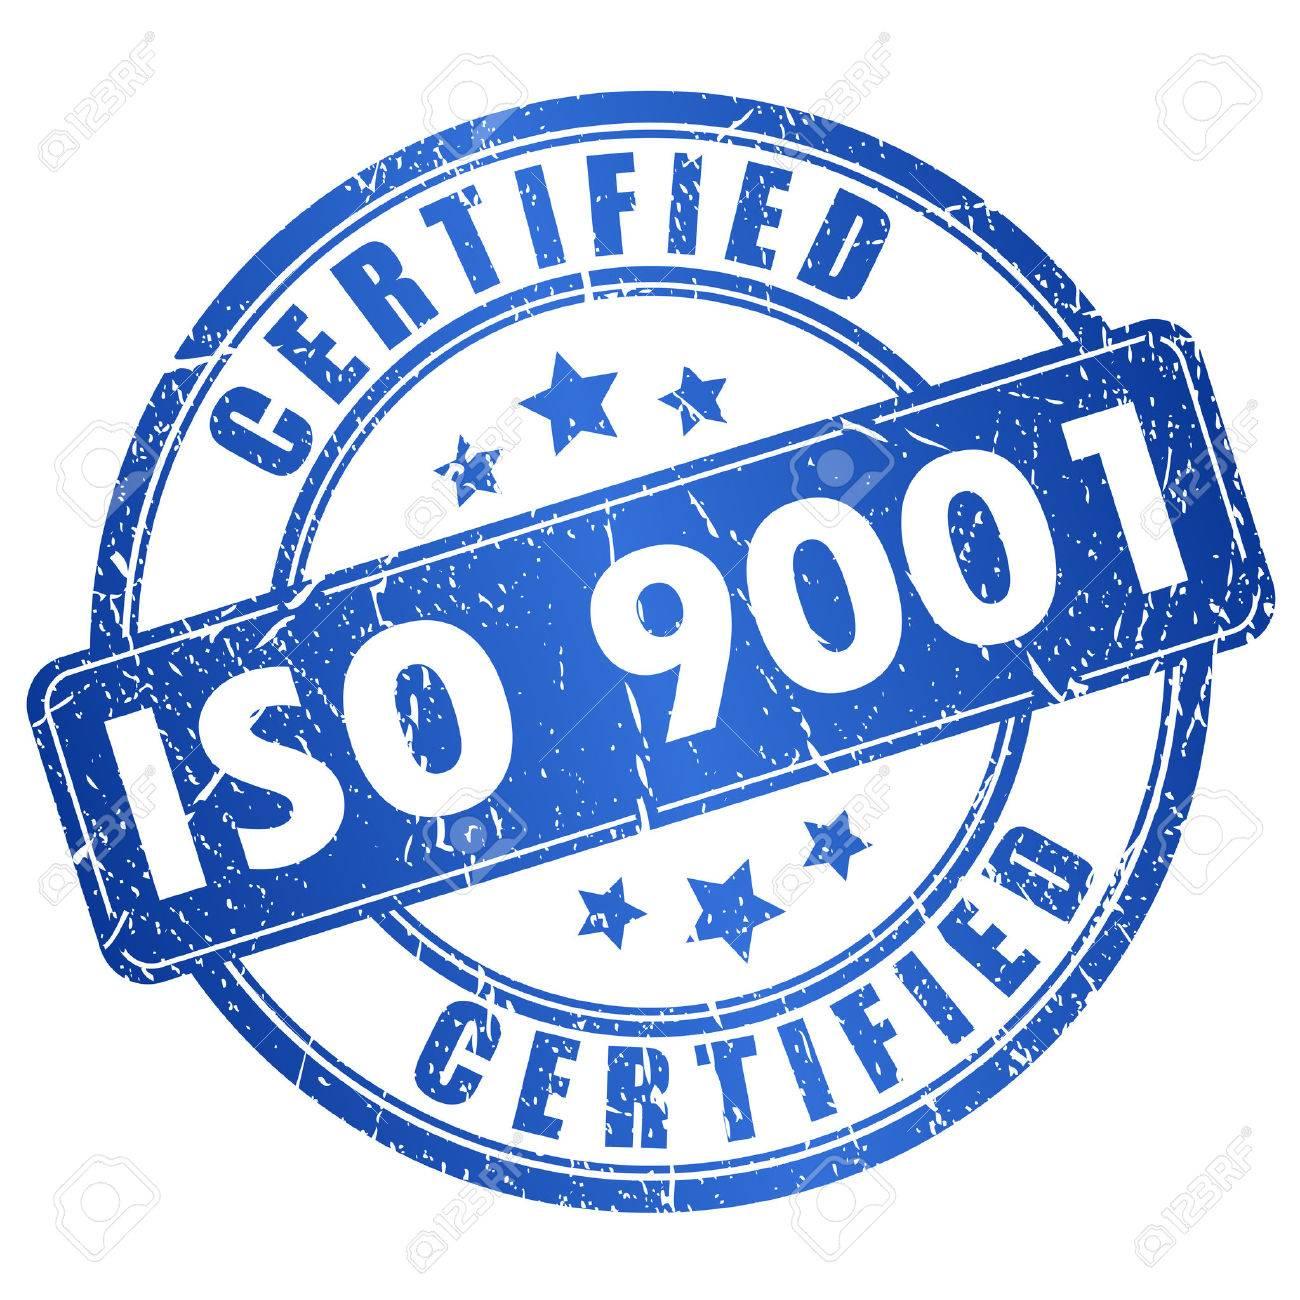 ISO certified in muktsar